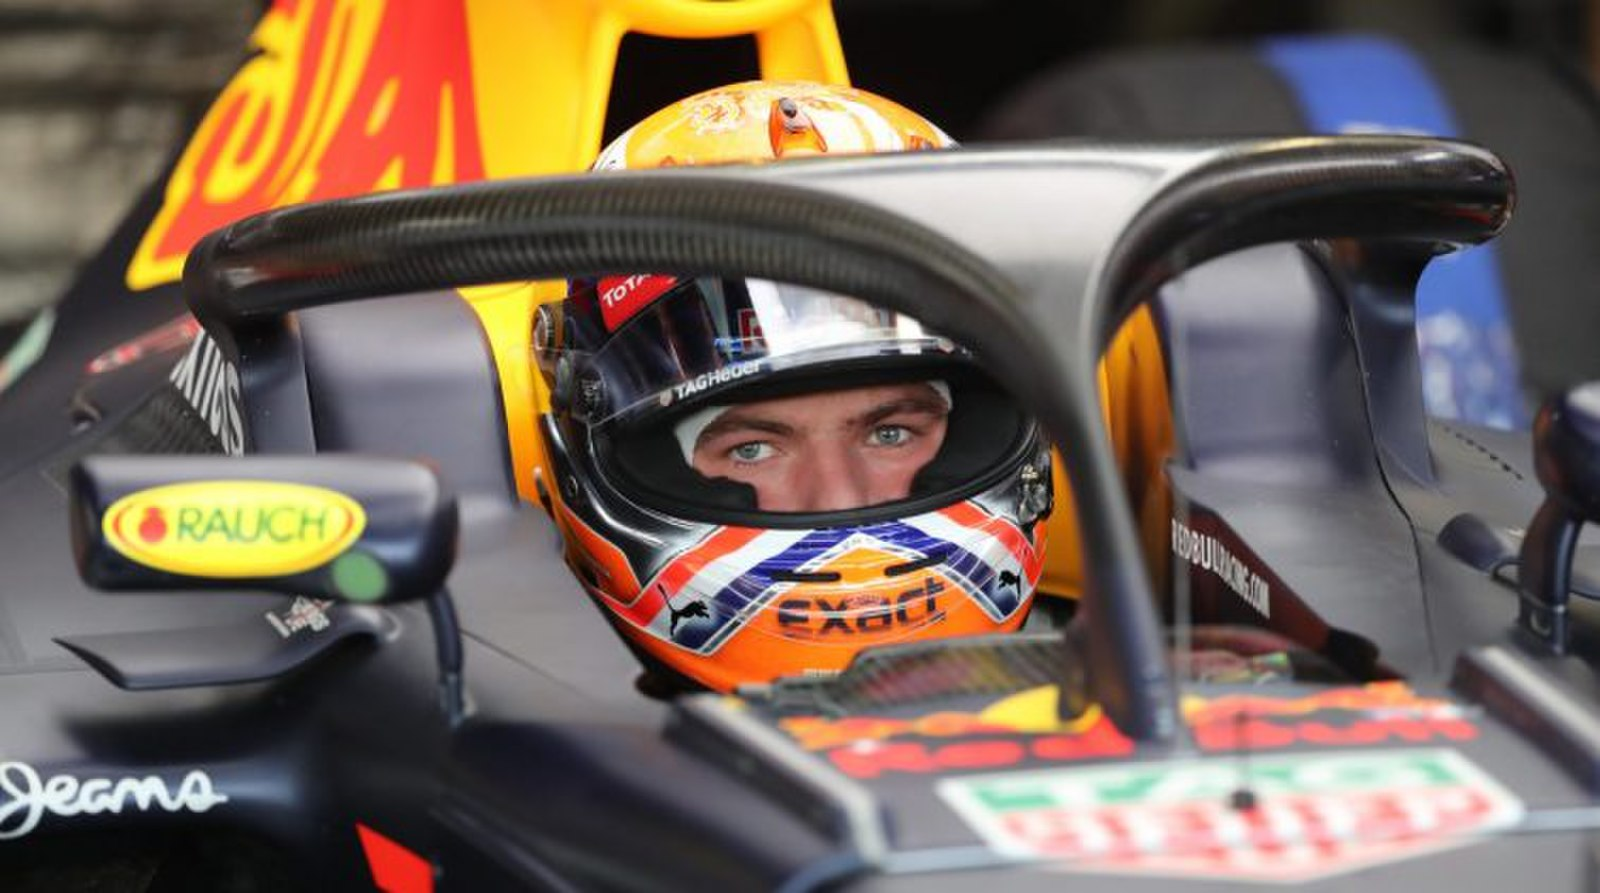 Max Verstappen sitting in his Red Bull car